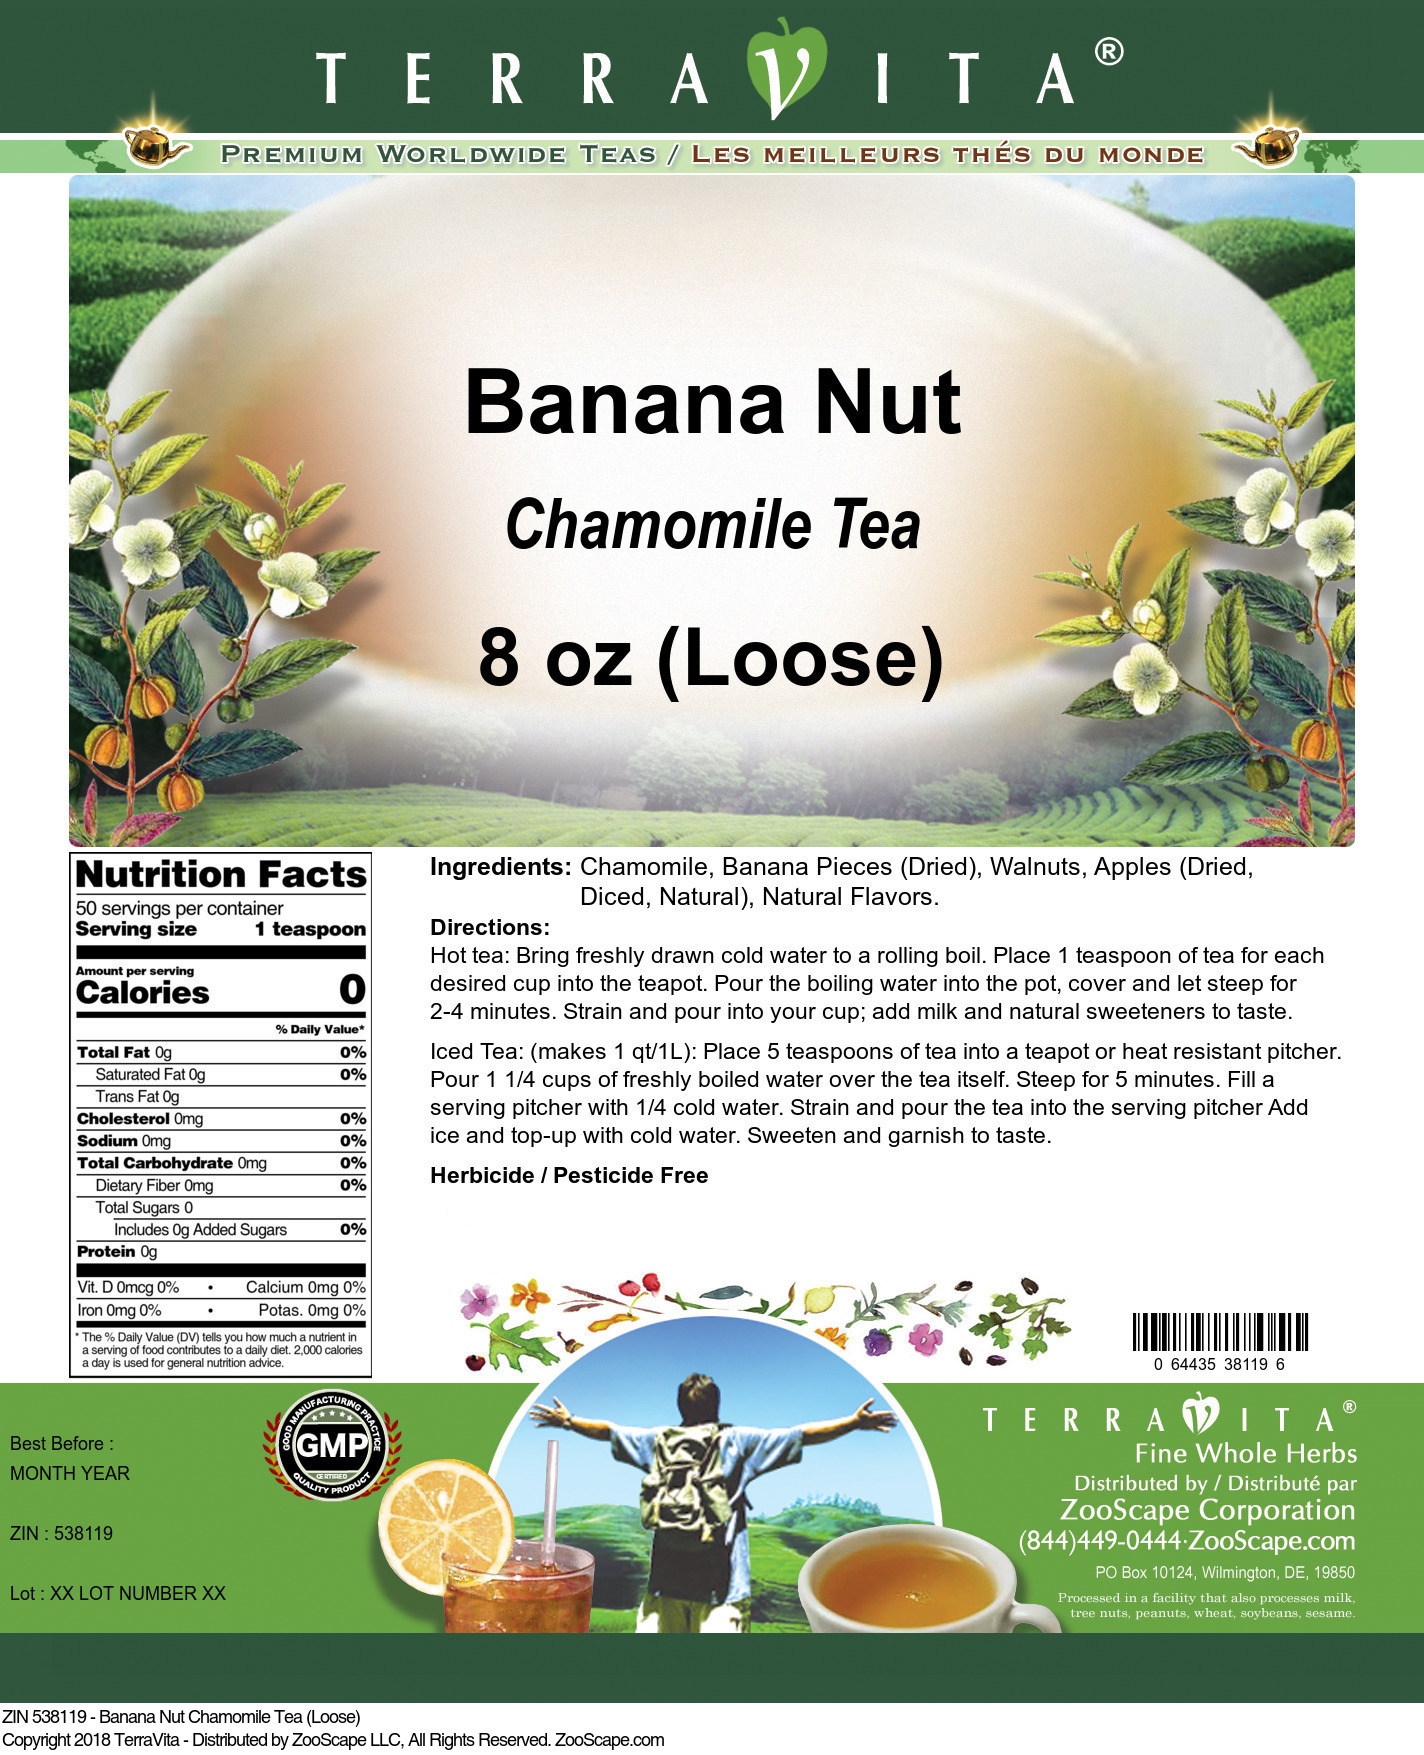 Banana Nut Chamomile Tea (Loose)